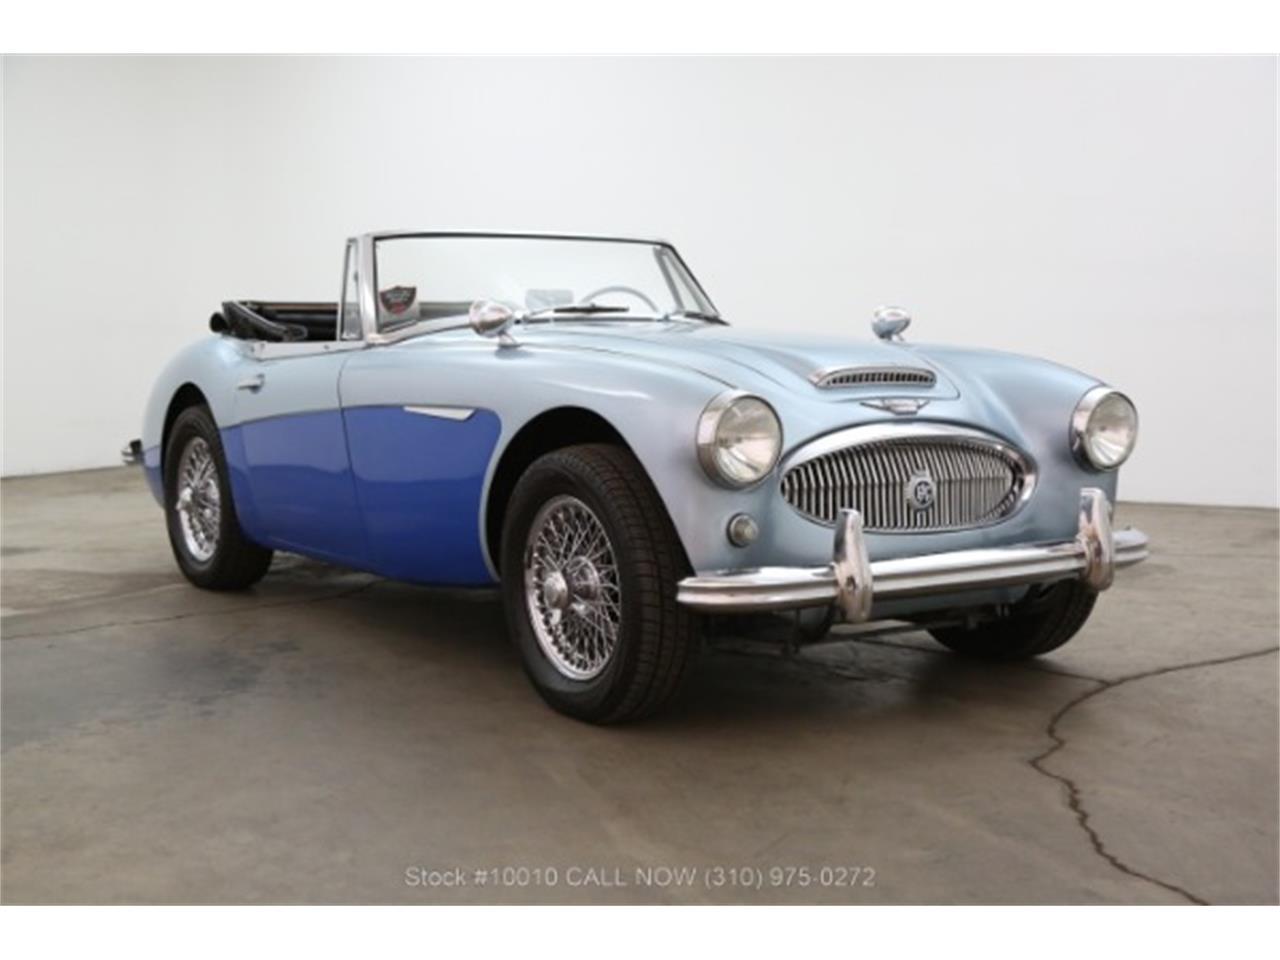 Classic Austin-Healey for Sale on ClassicCars.com